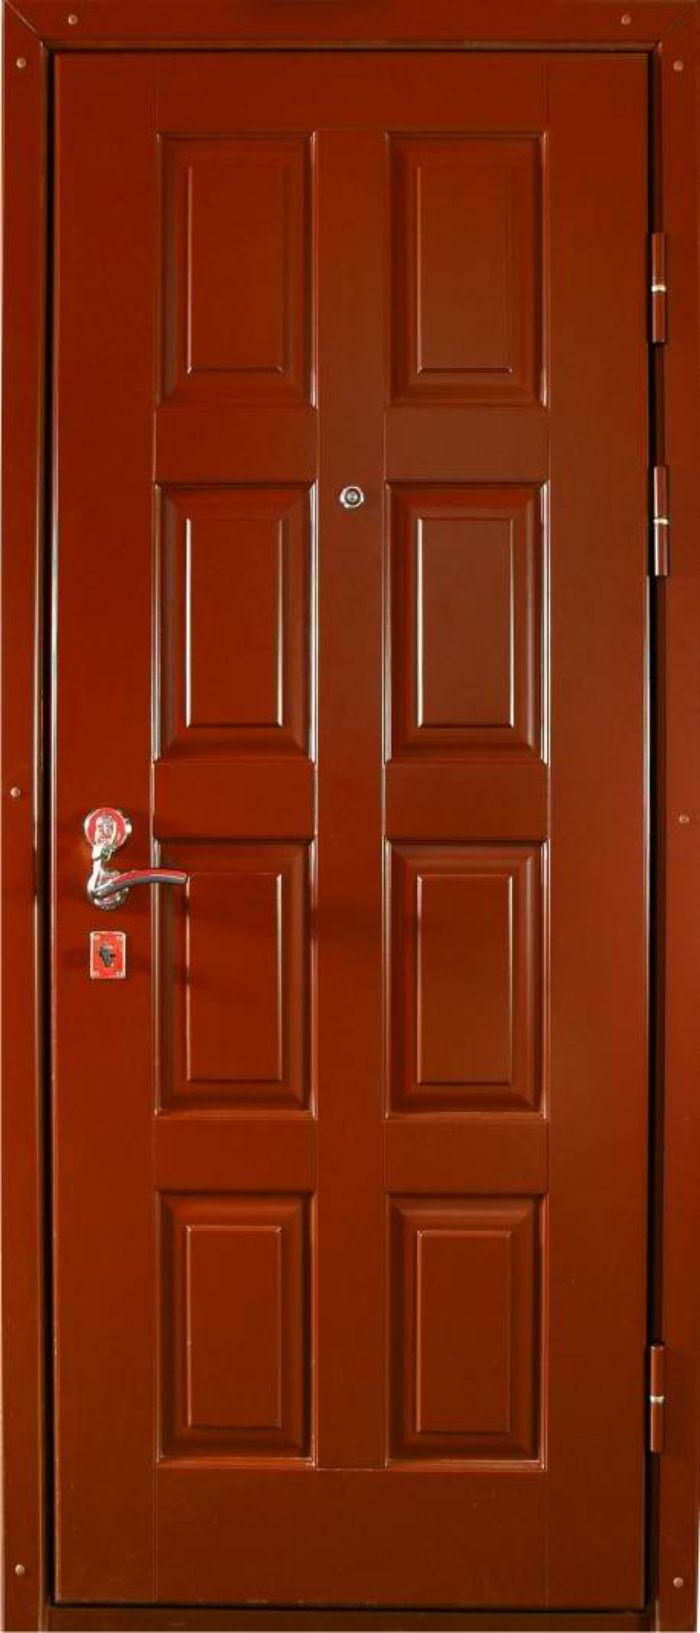 цены на металлические двери стандарт